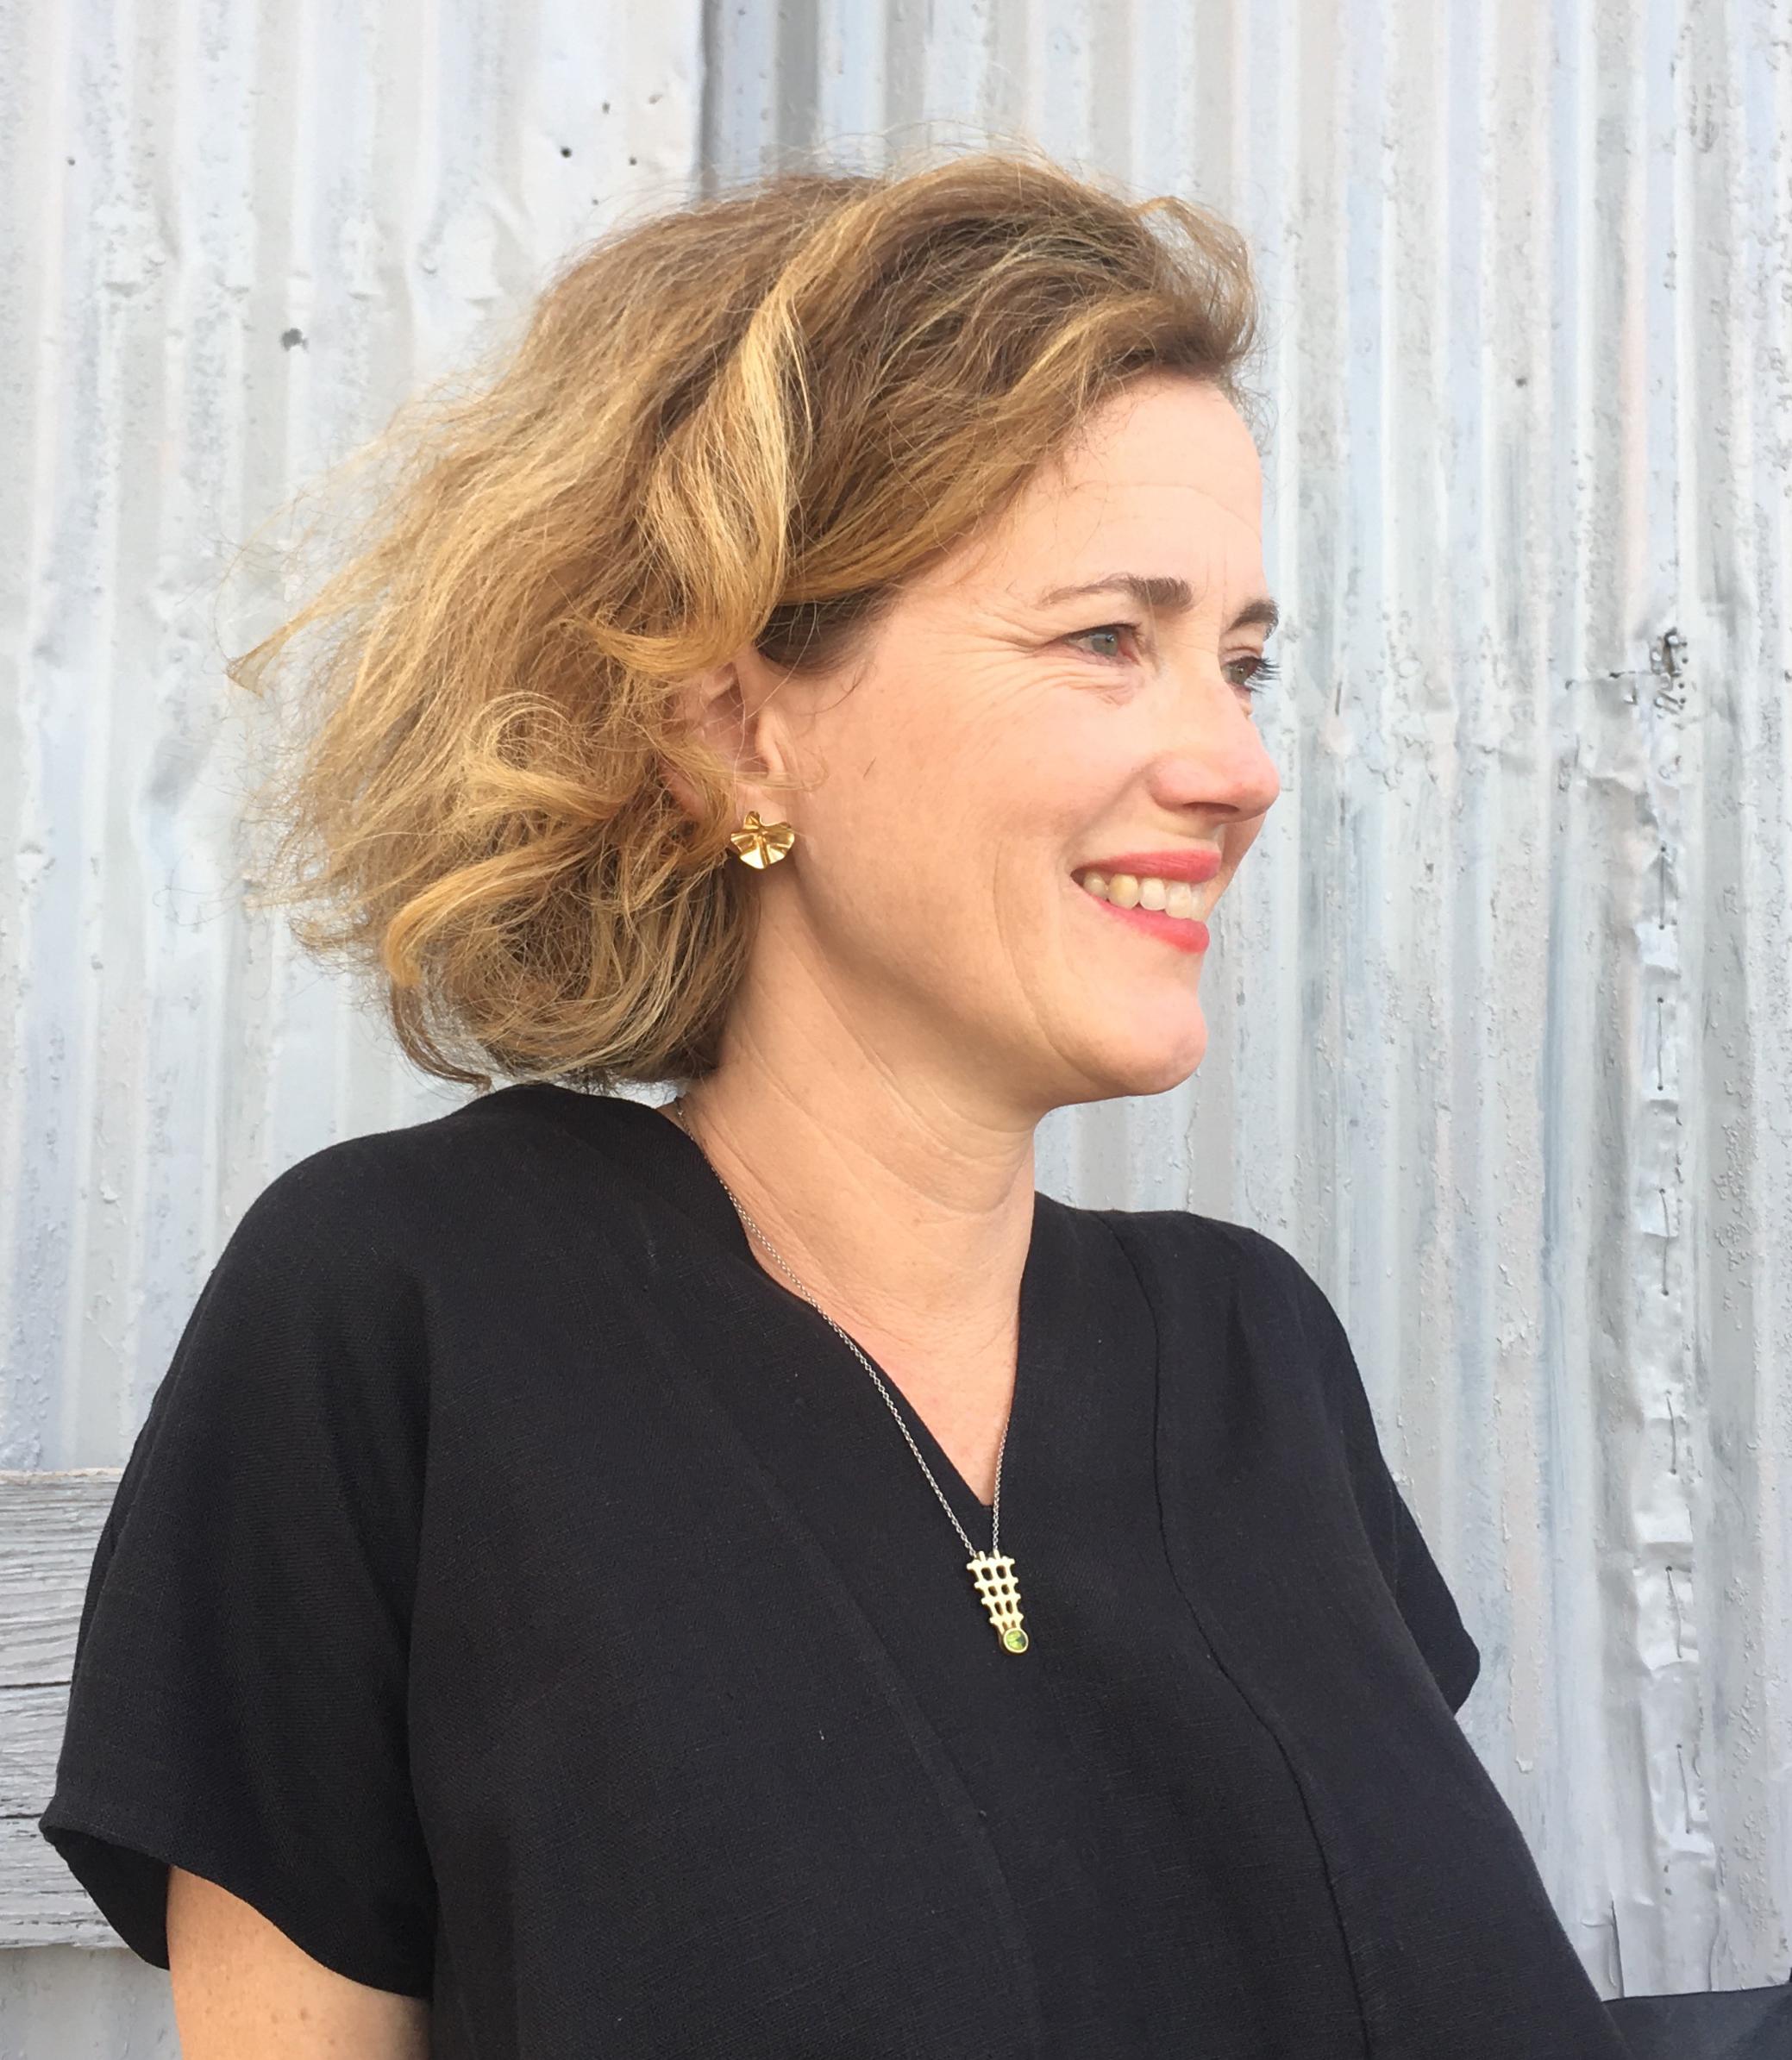 Daphne Beal